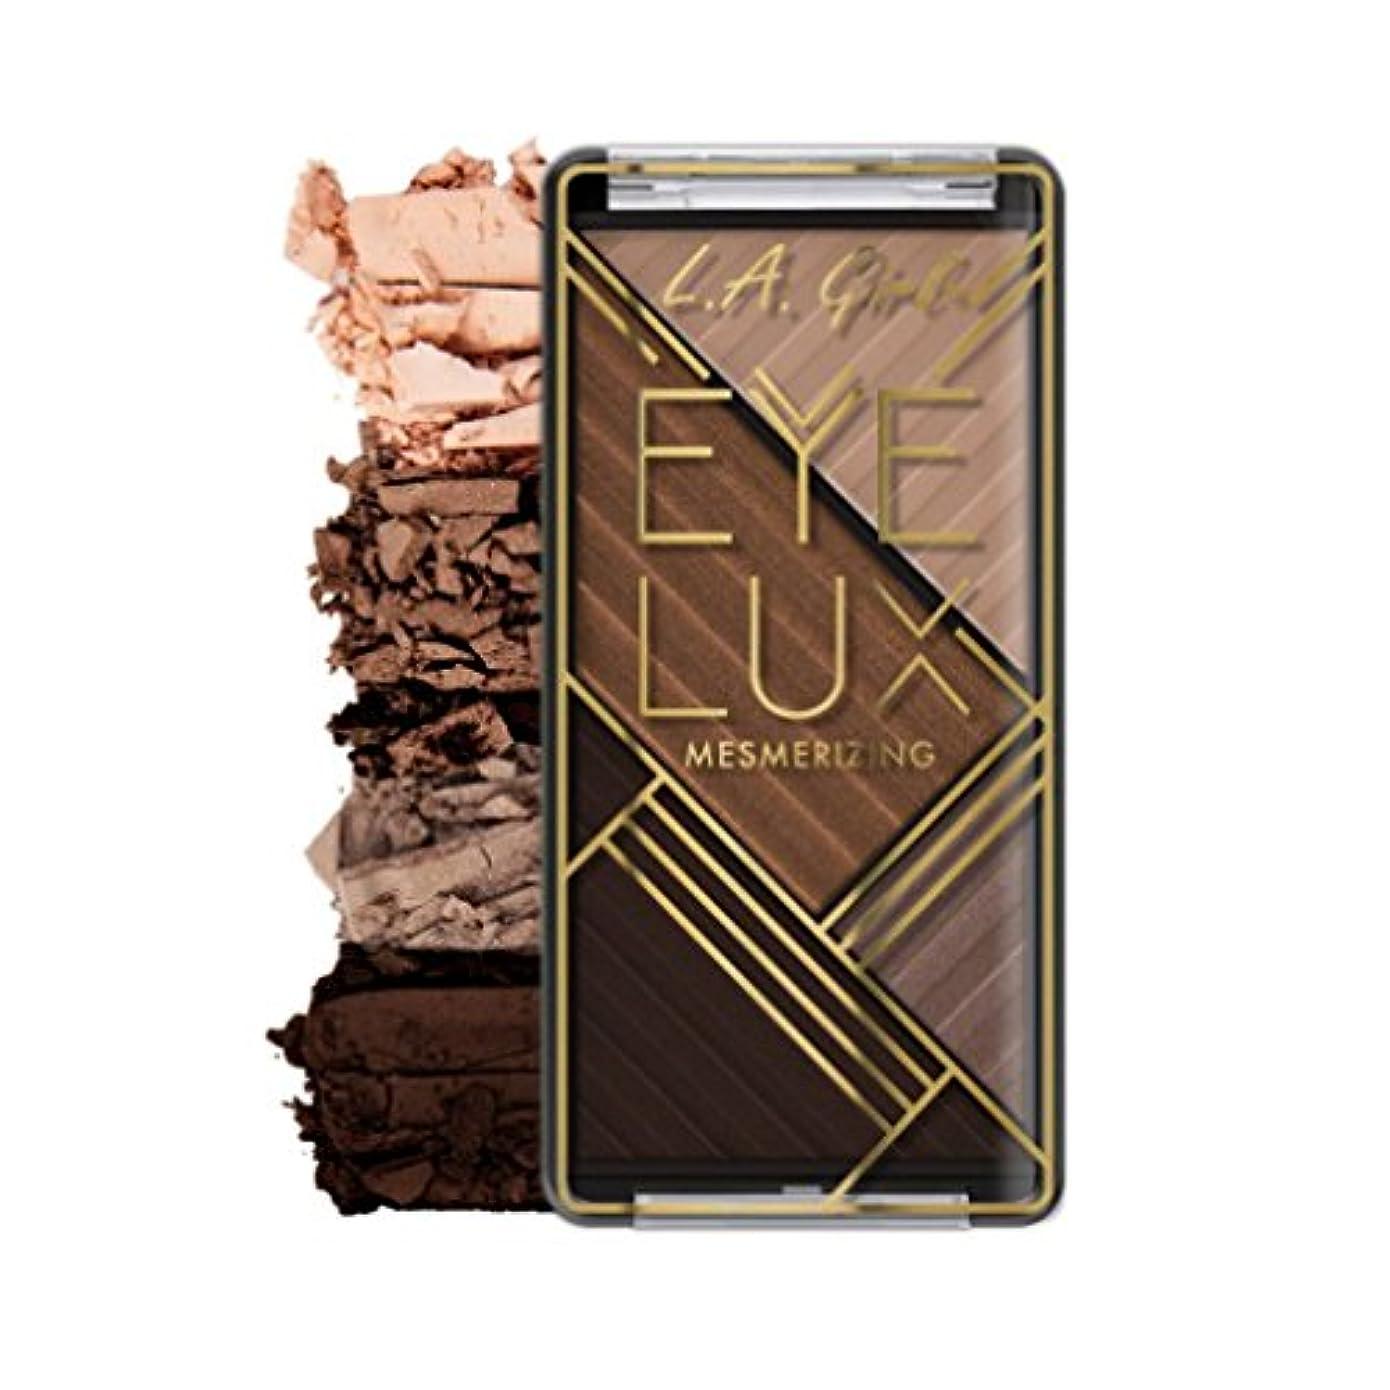 (3 Pack) L.A. GIRL Eye Lux Mesmerizing Eyeshadow - Idolize (並行輸入品)